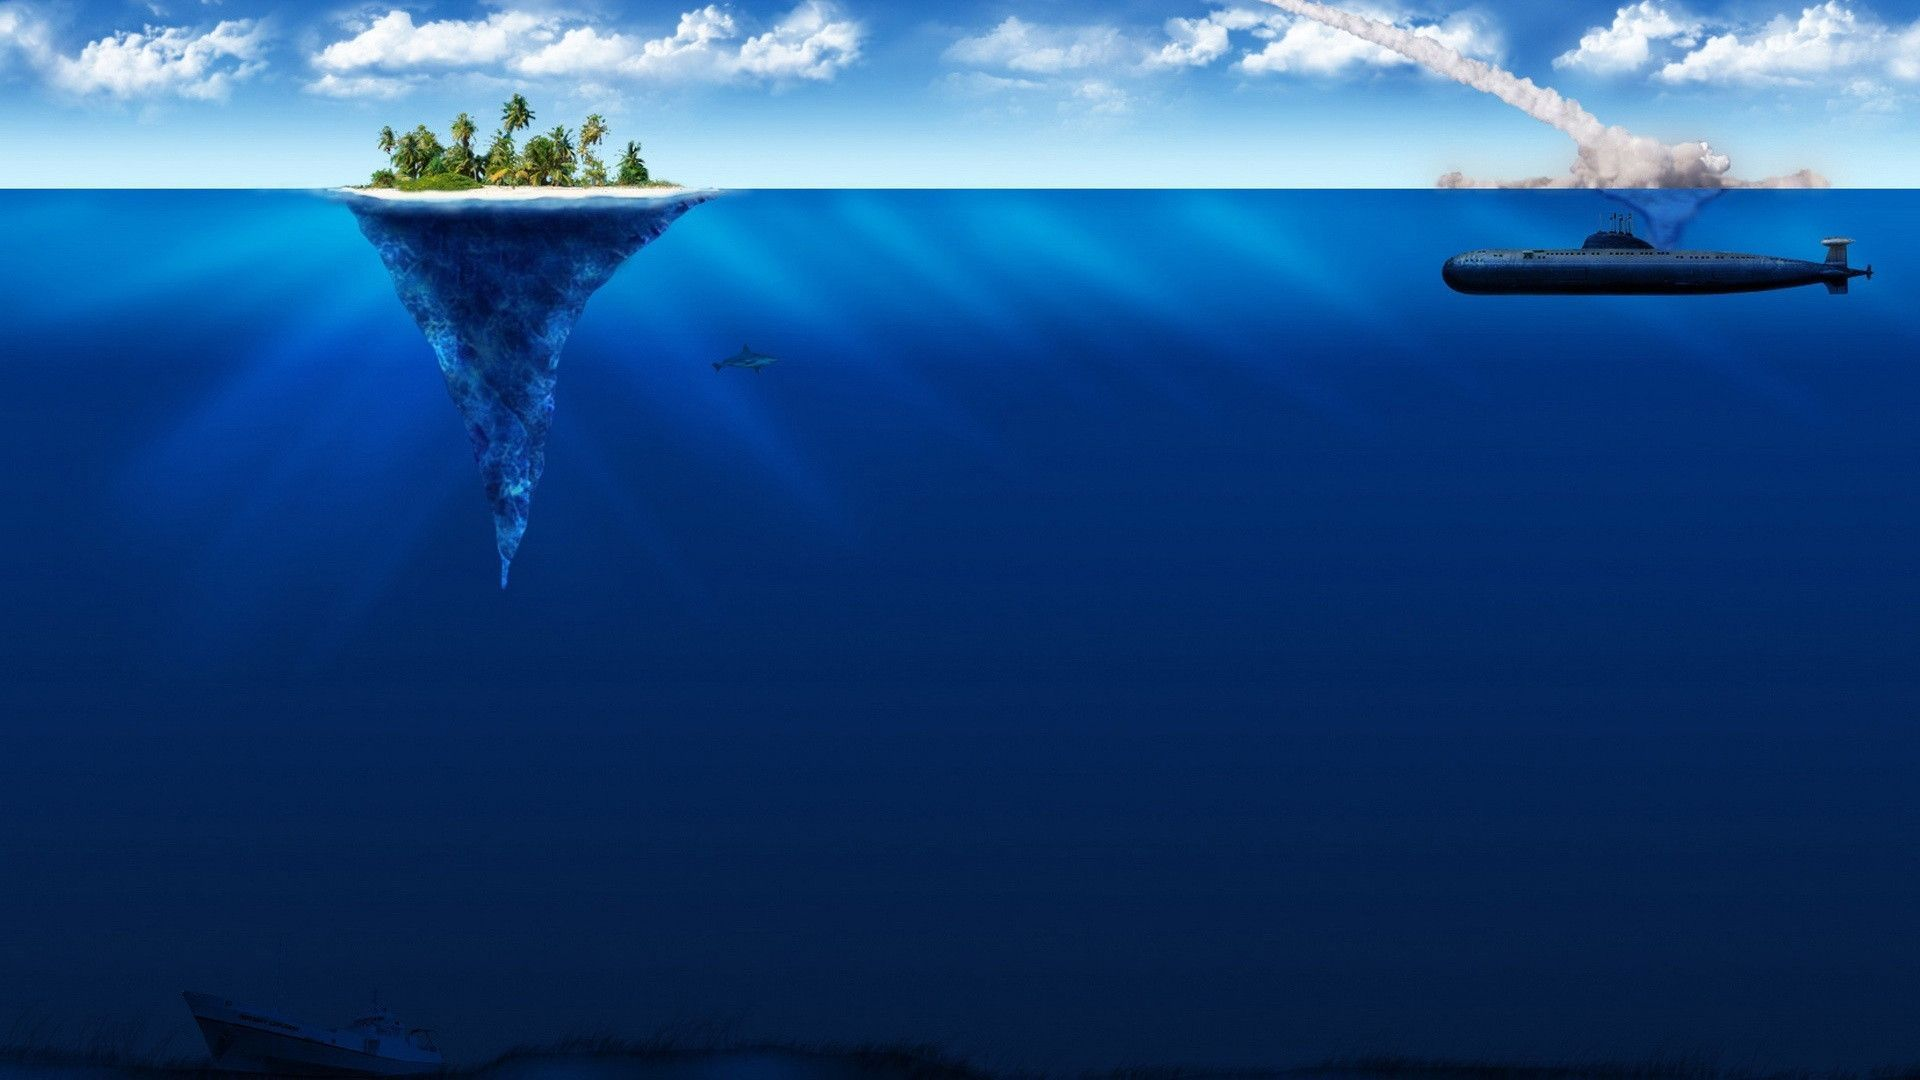 Deep Sea Wallpapers - Wallpaper Cave | Epic Car Wallpapers | Underwater wallpaper, Beach ...